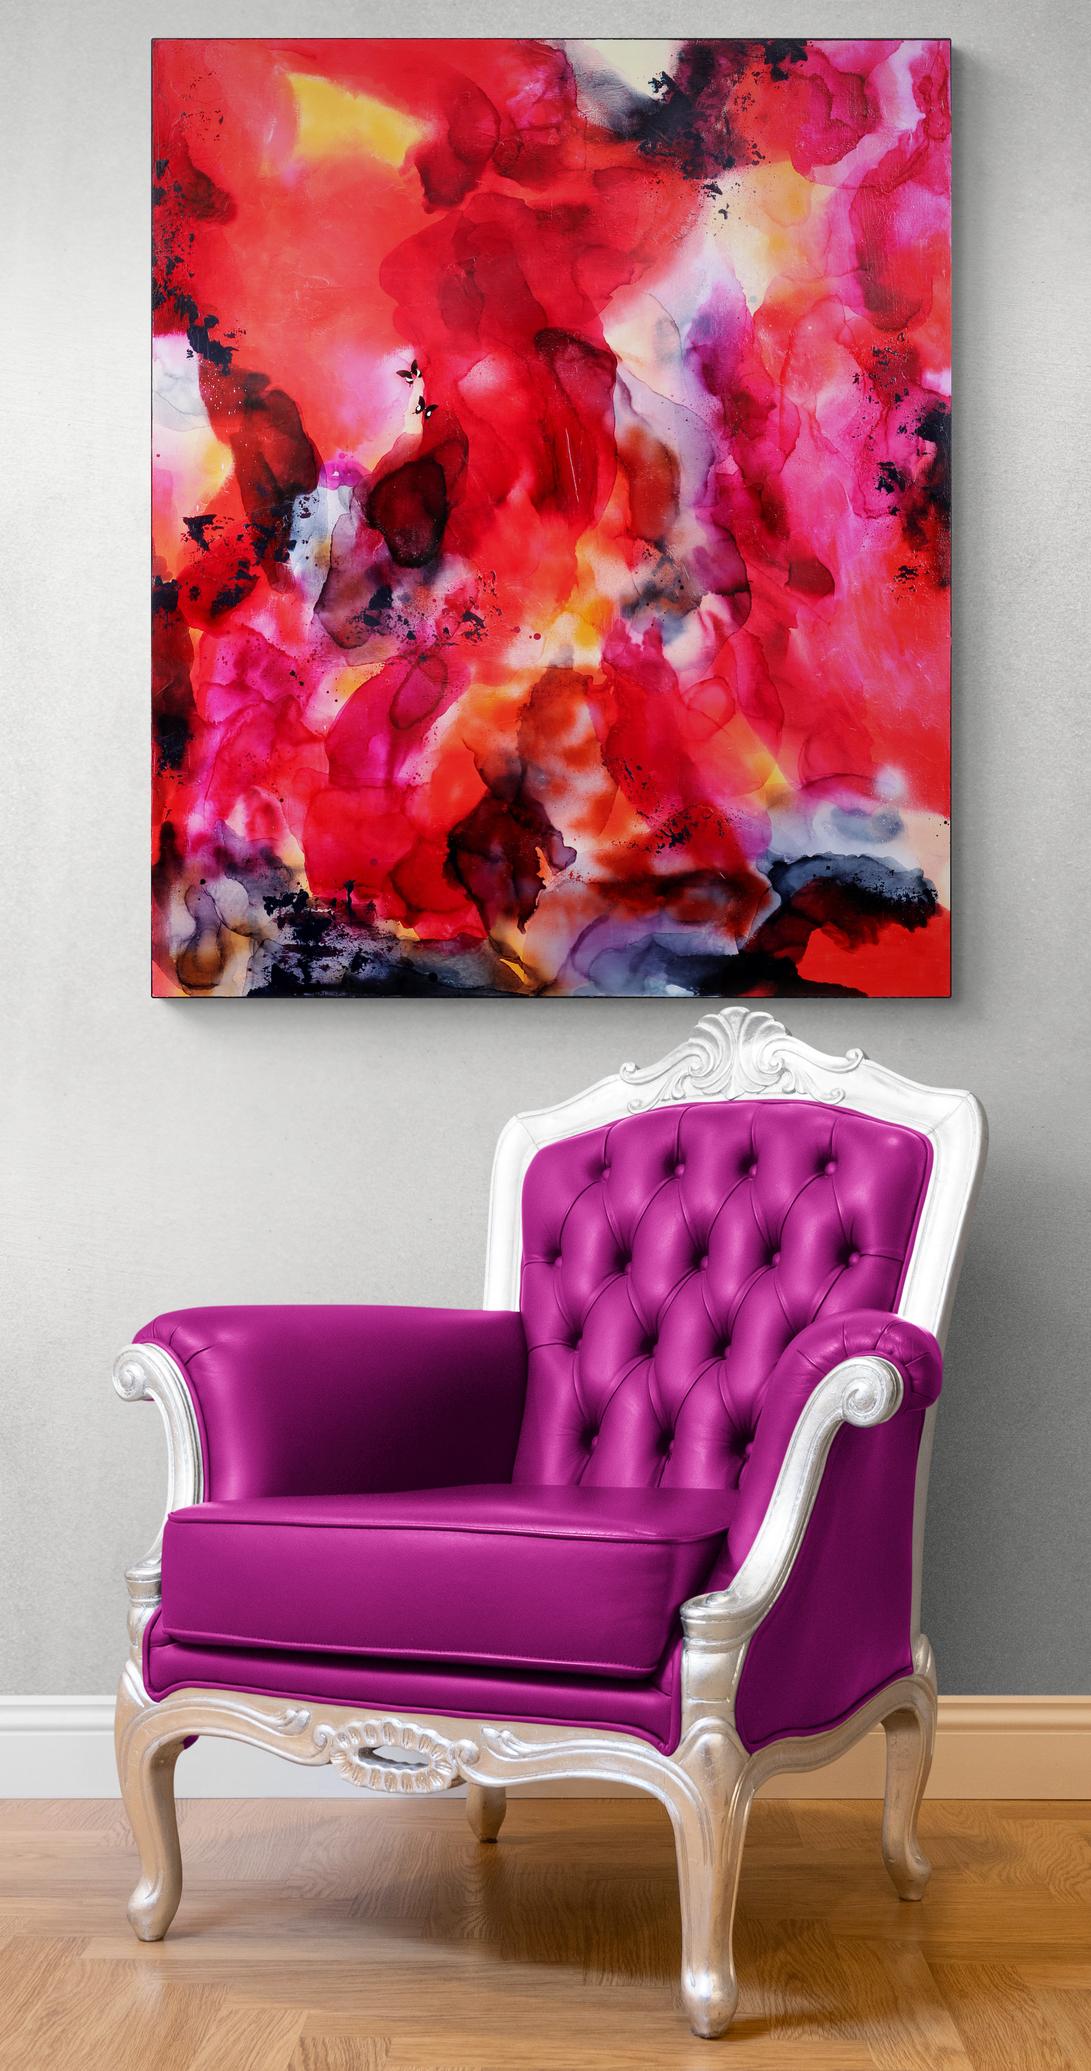 Tunku Khalsom - Hot Pink Love - Installation.jpg